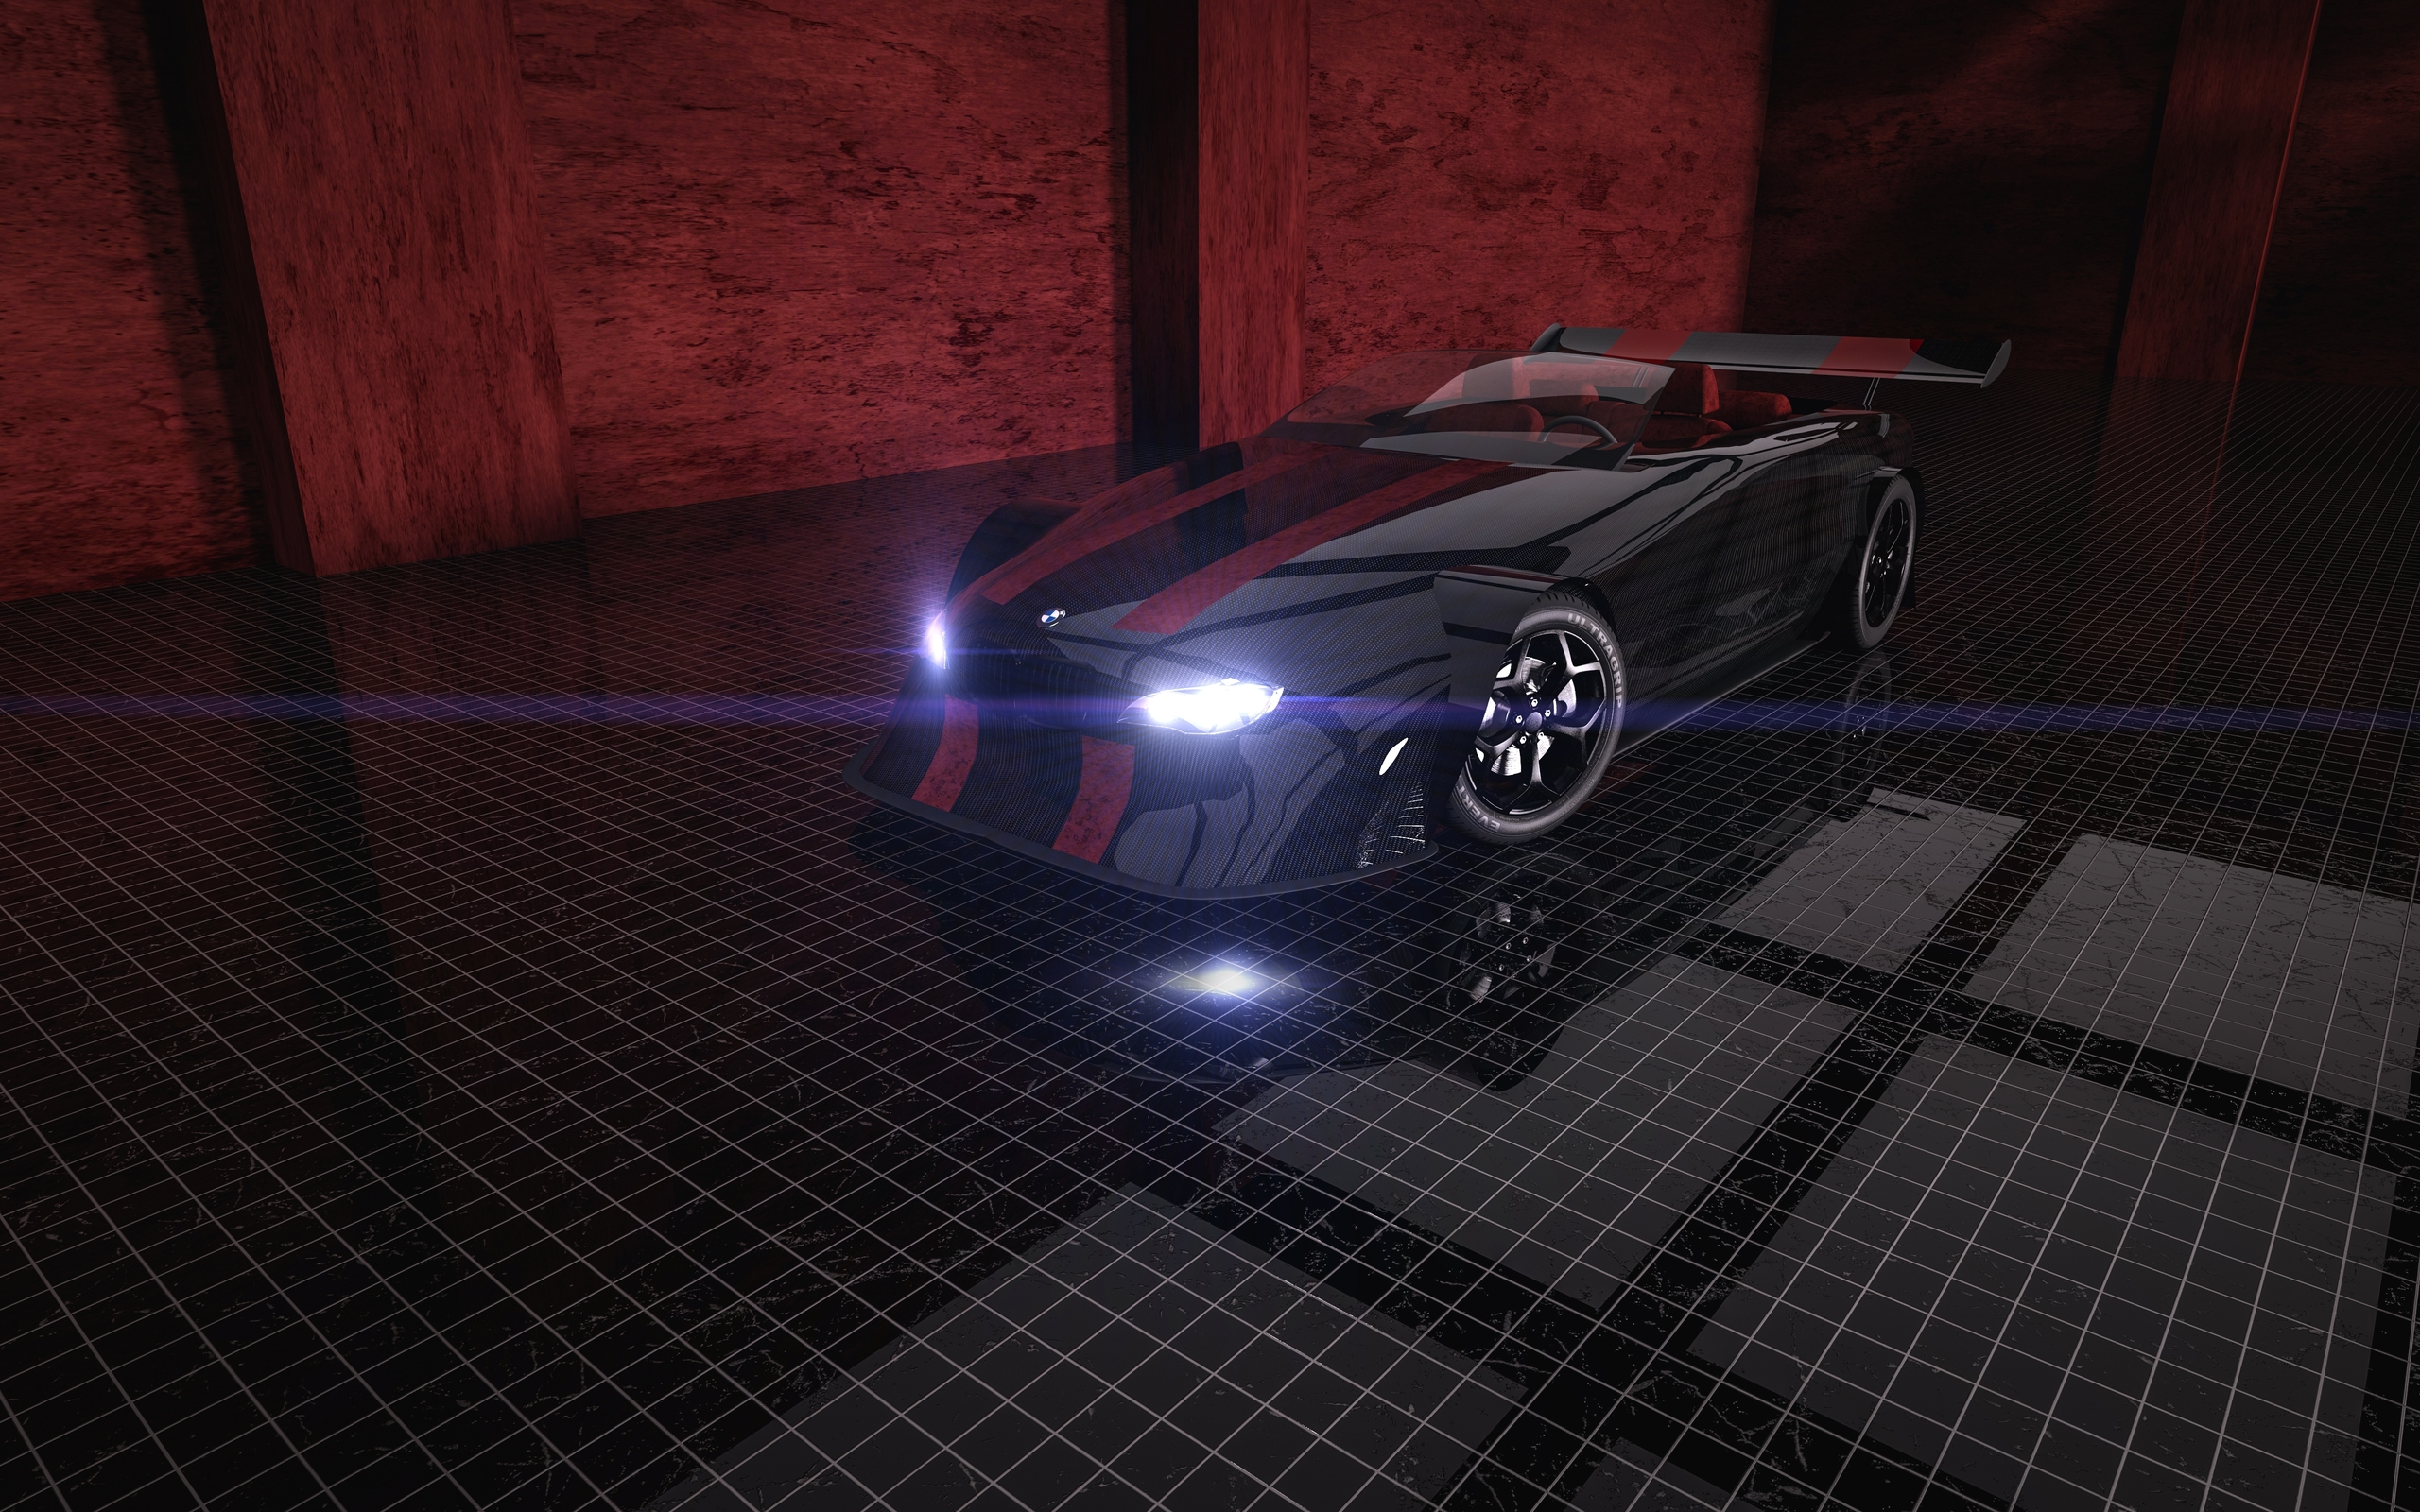 bmw-sport-car-prototype-pp.jpg